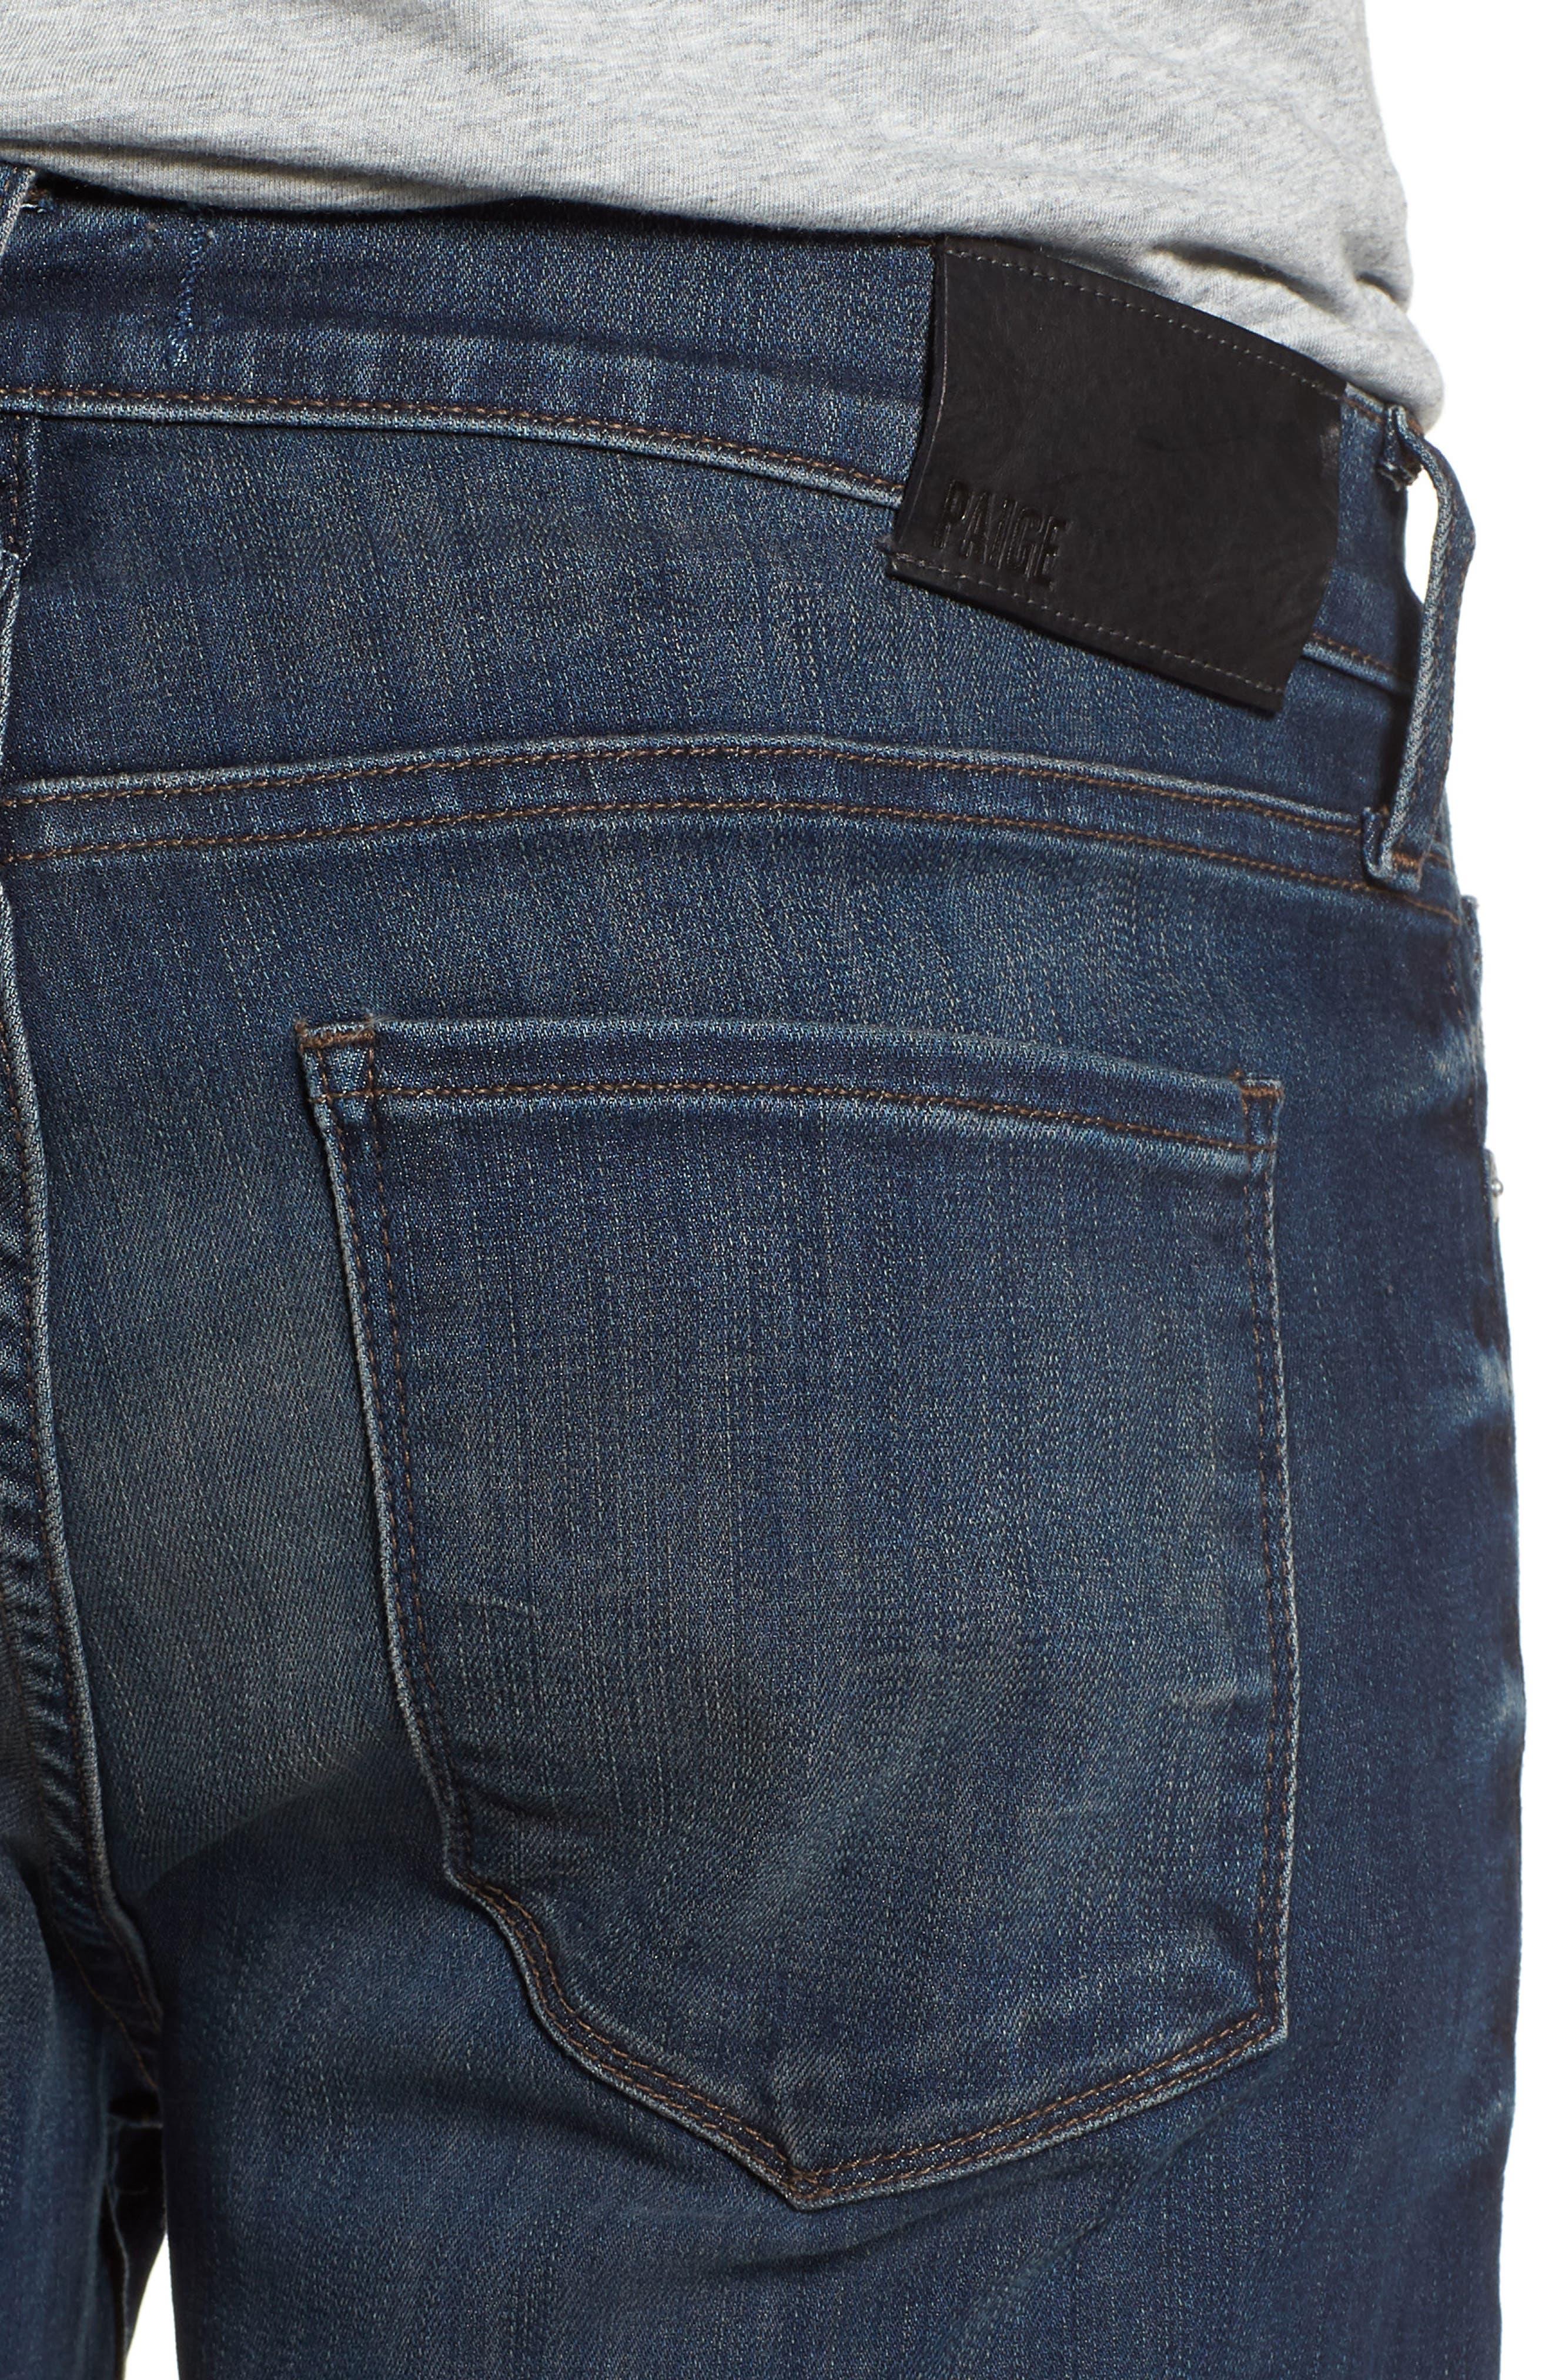 Transcend - Lennox Slim Fit Jeans,                             Alternate thumbnail 4, color,                             Freeman